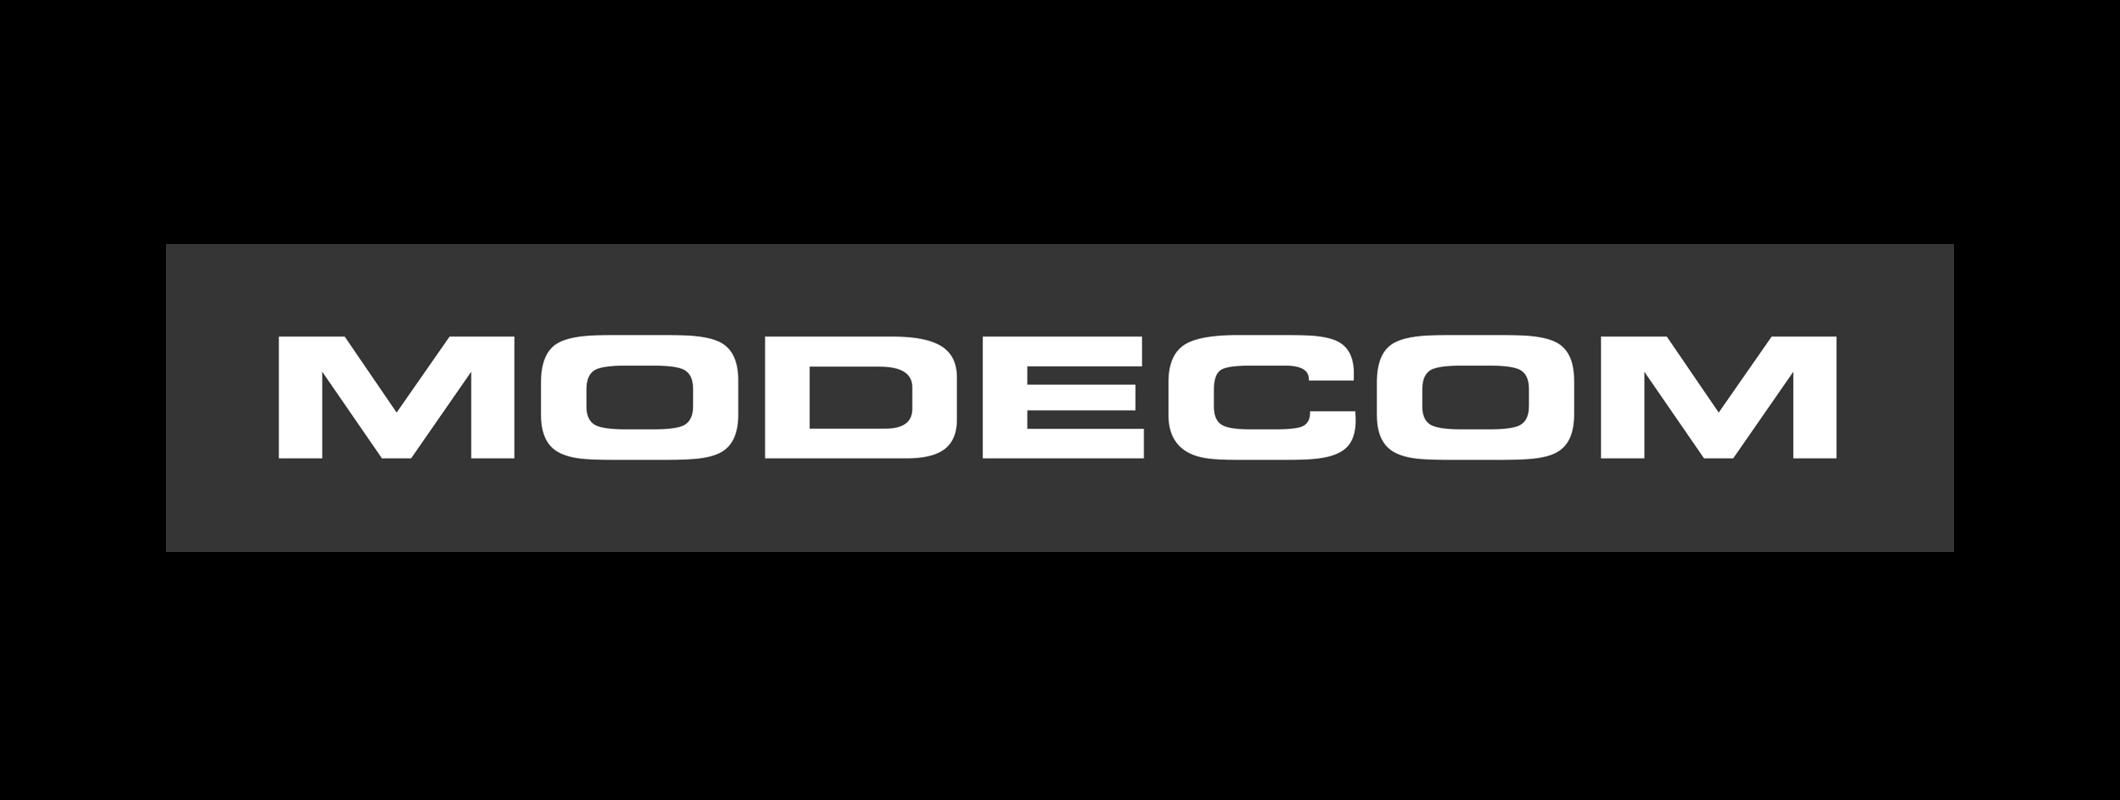 modecom_logo_BW3